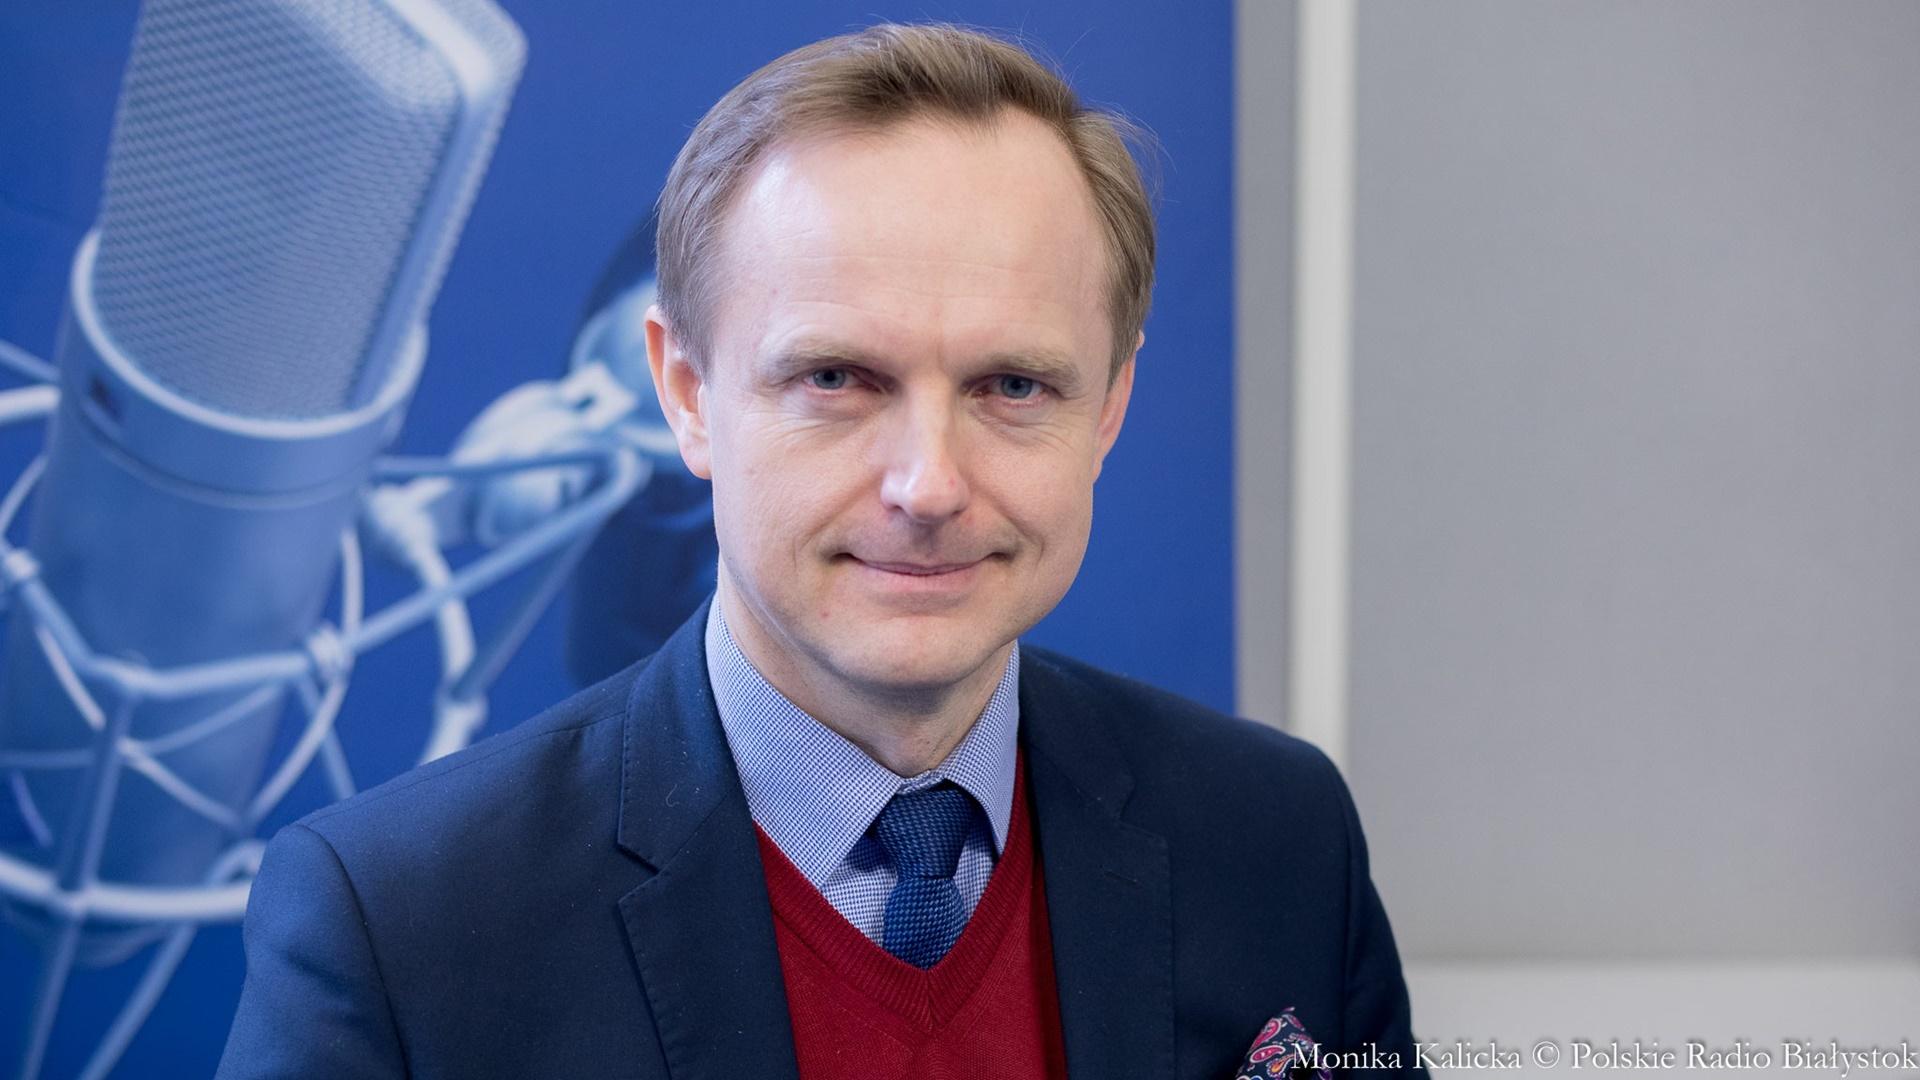 Marcin Moniuszko, fot. Monika Kalicka